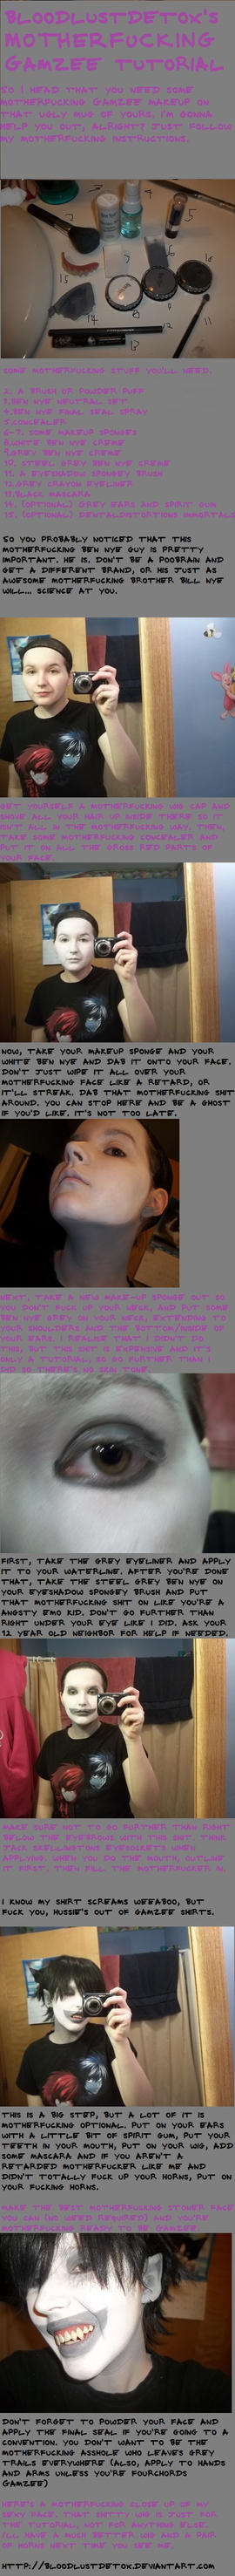 Motherfucking Gamzee Makeup Tutorial by BloodlustDetox